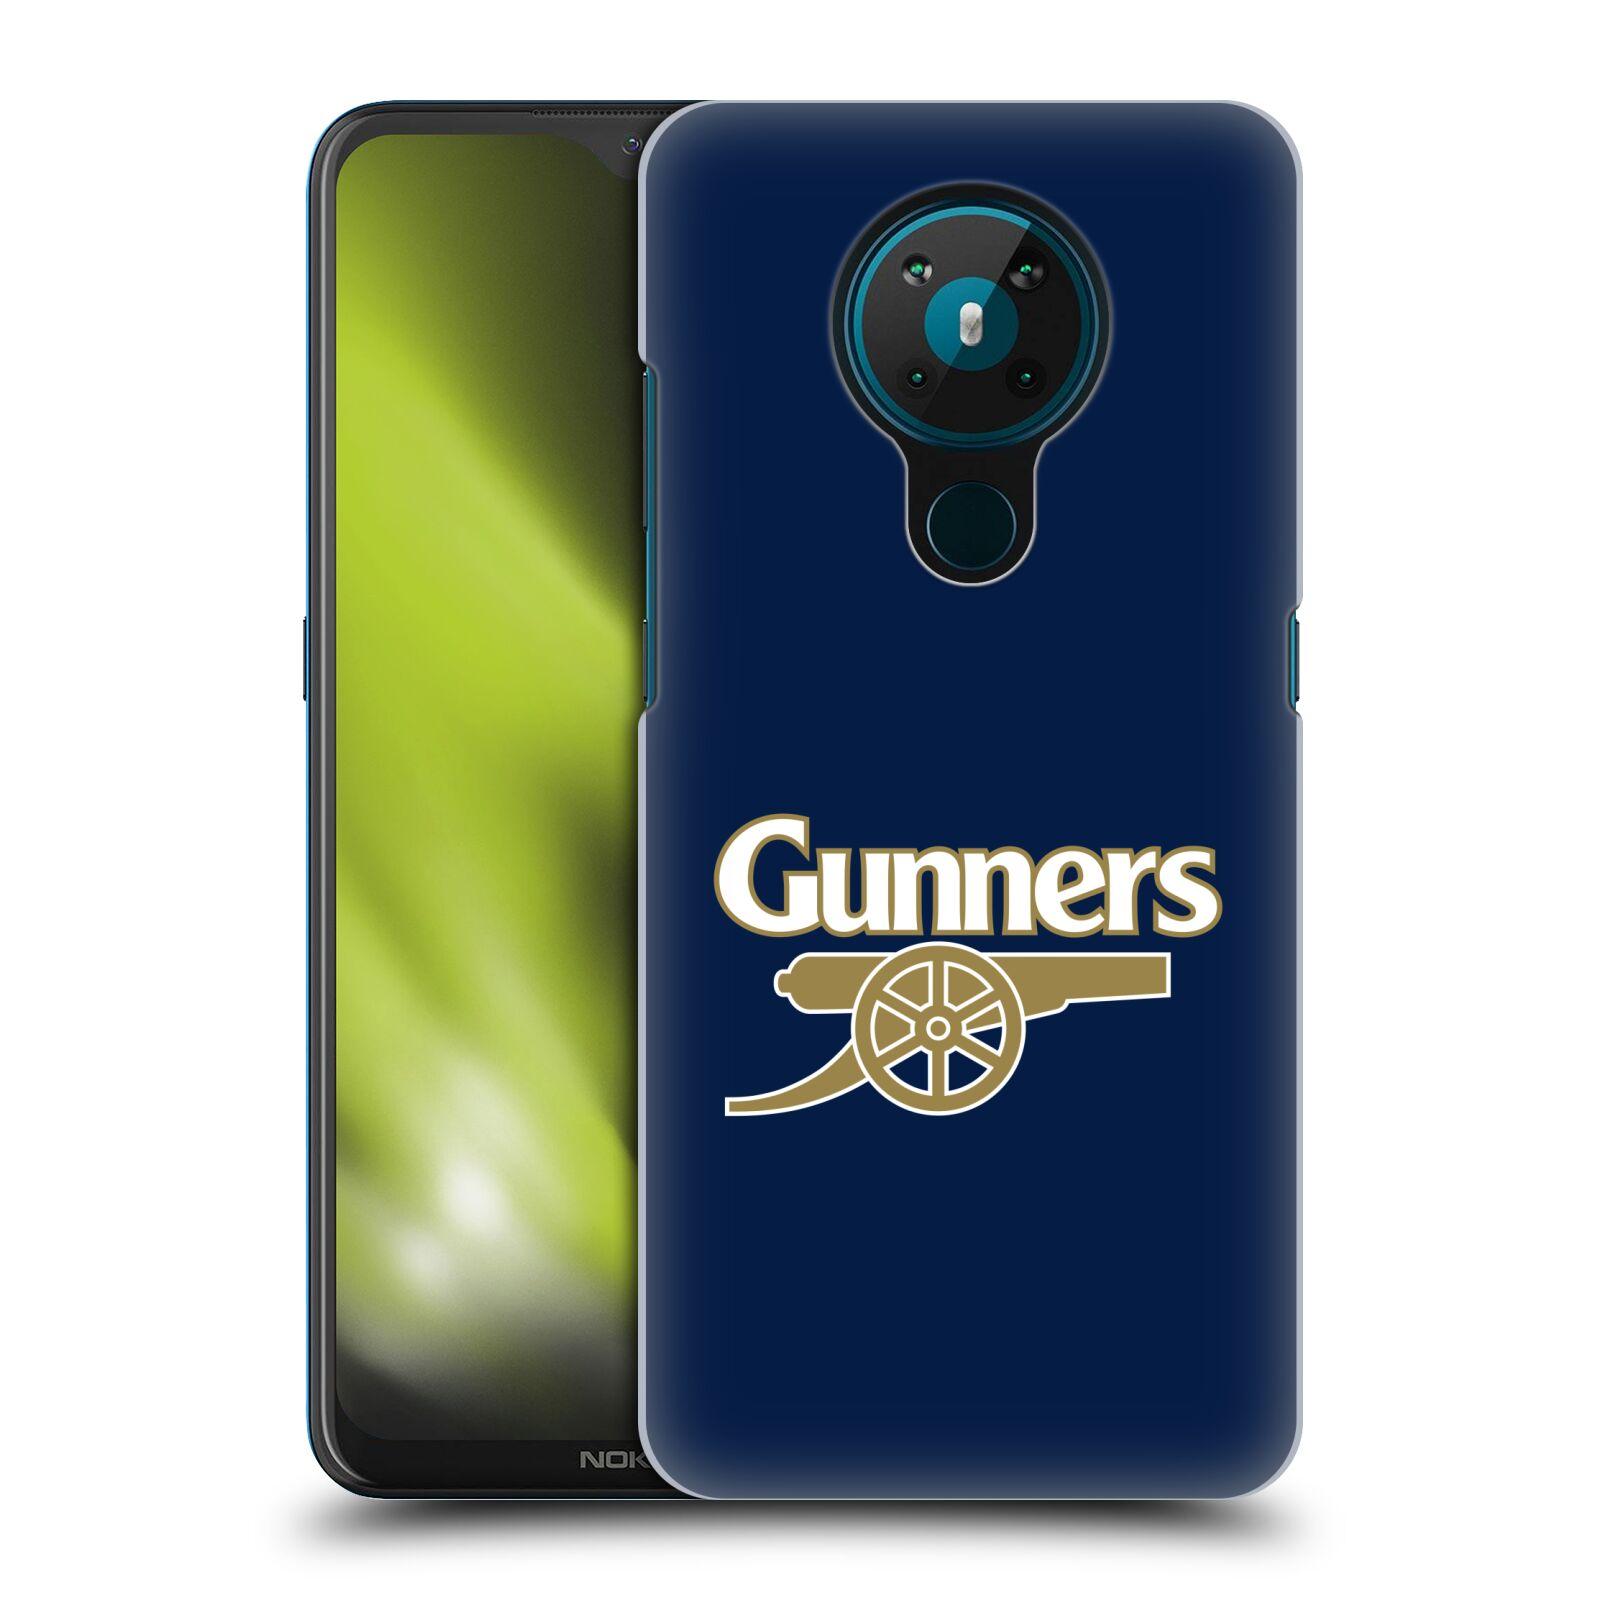 Plastové pouzdro na mobil Nokia 5.3 - Head Case - Arsenal FC - Gunners